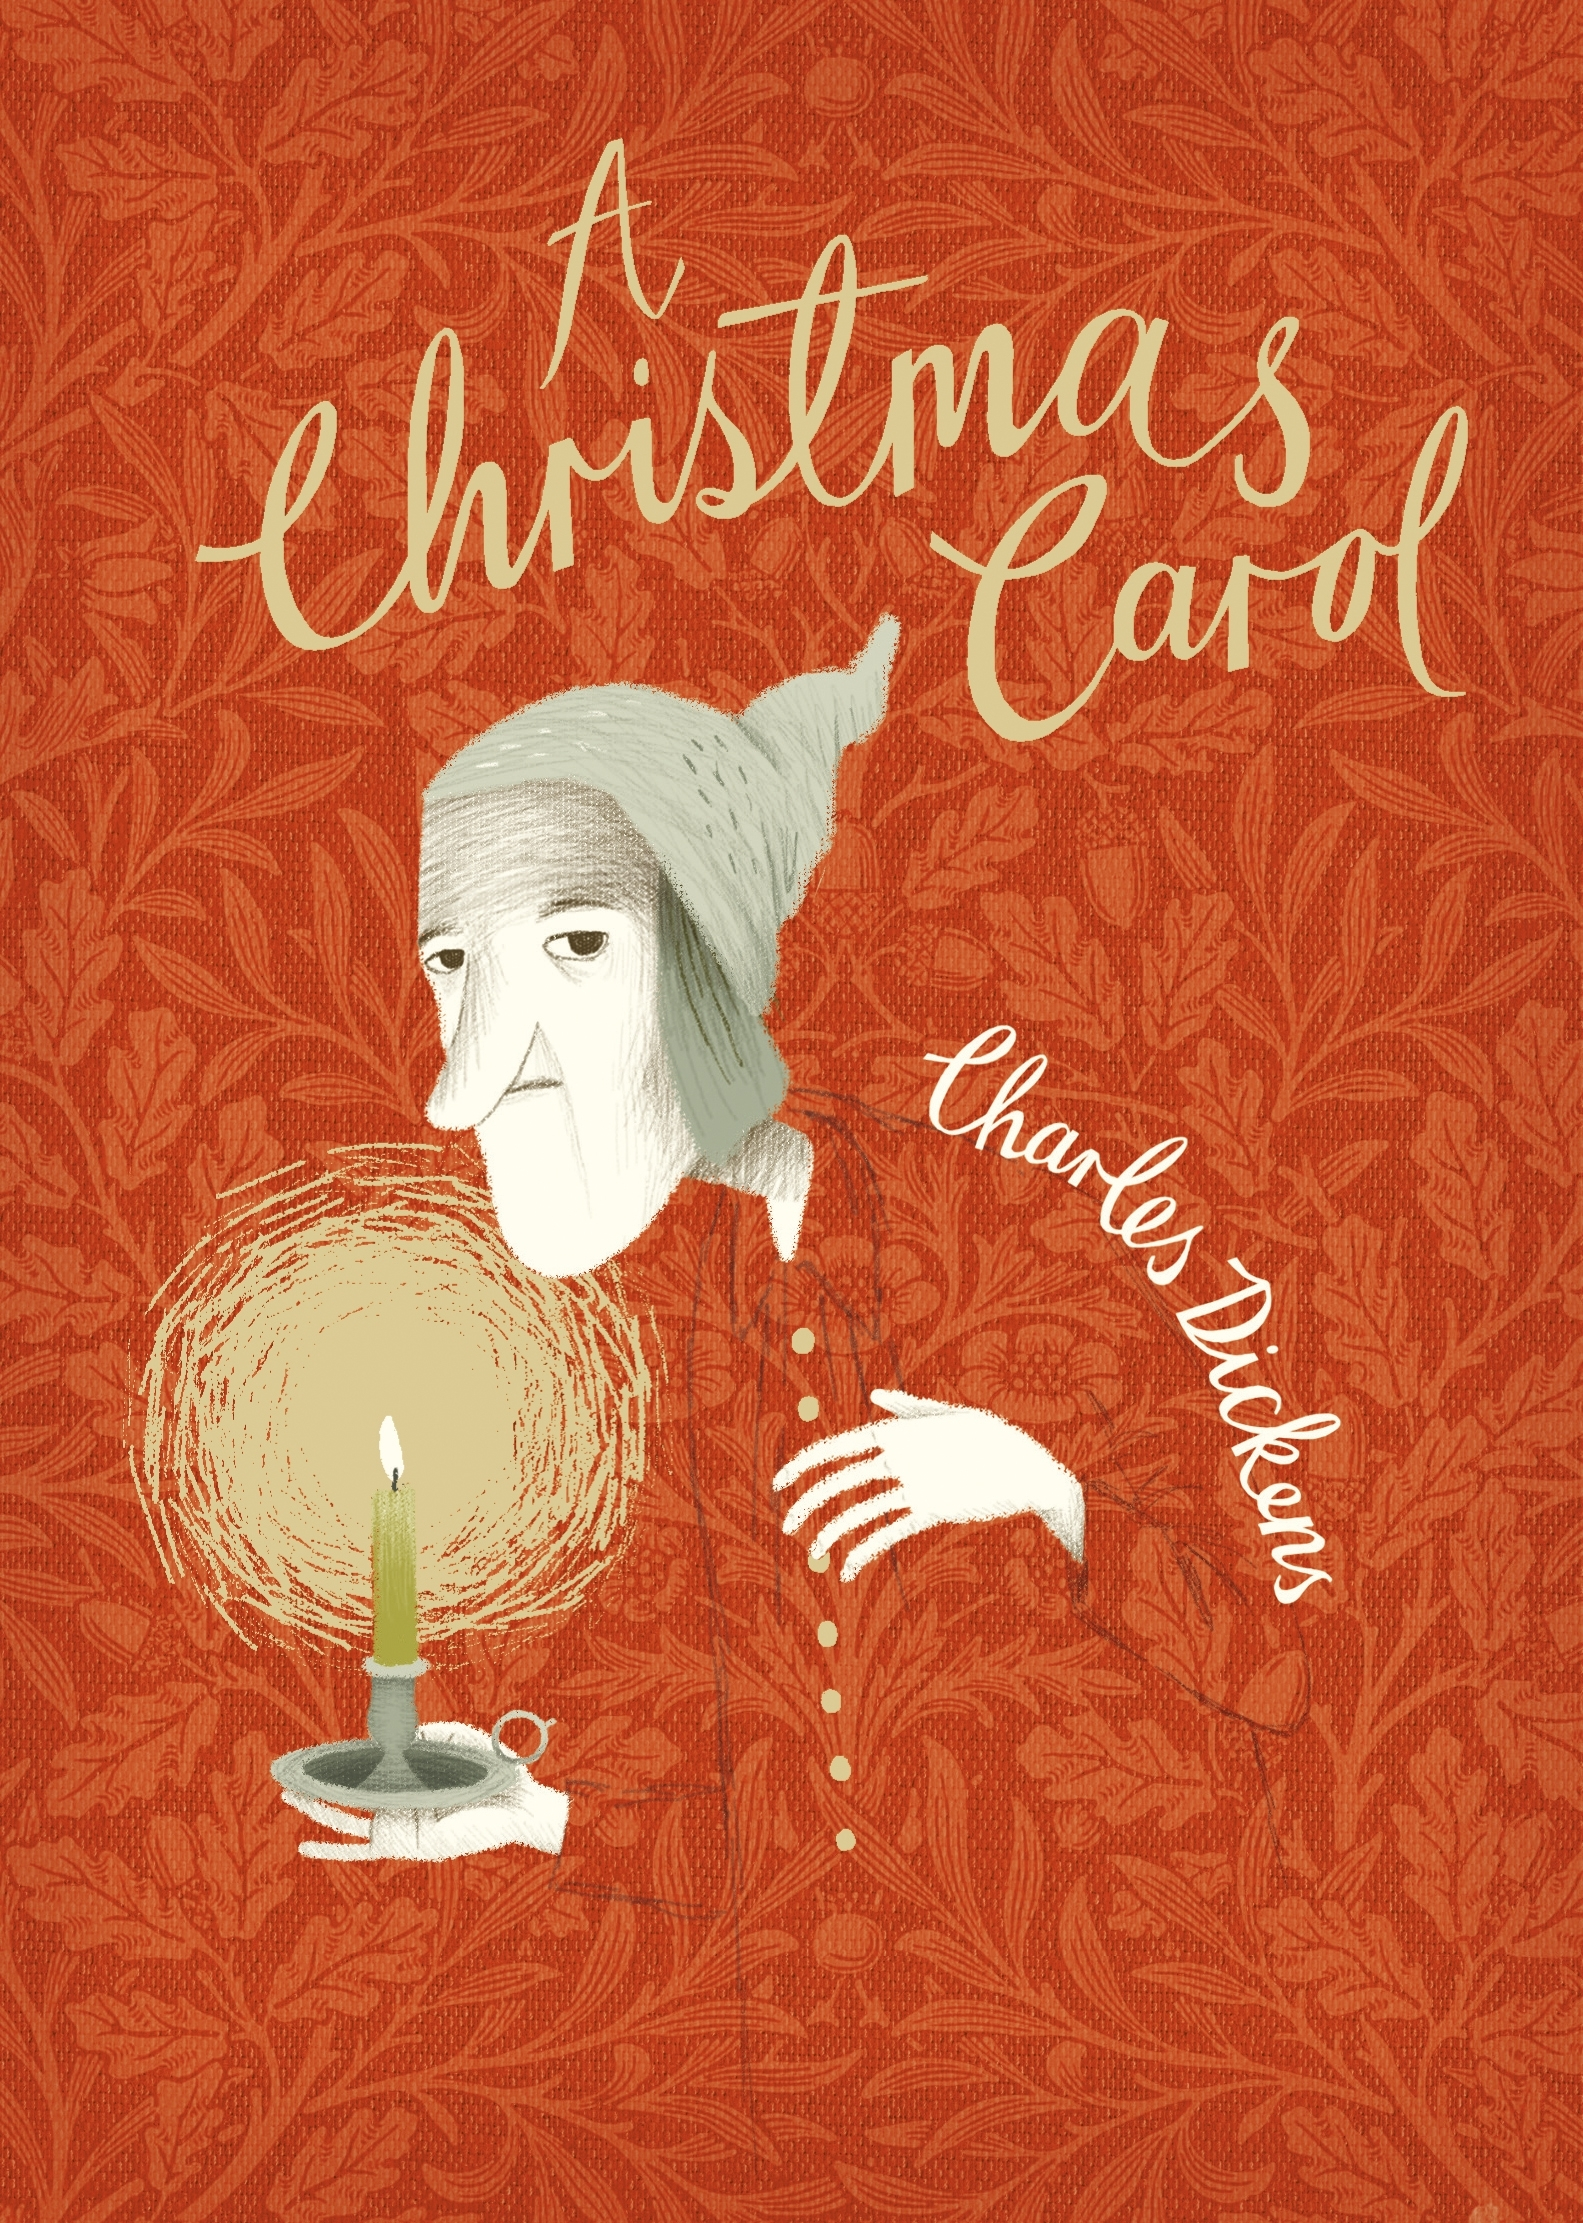 Christmas Carrol.A Christmas Carol V A Collector S Edition By Charles